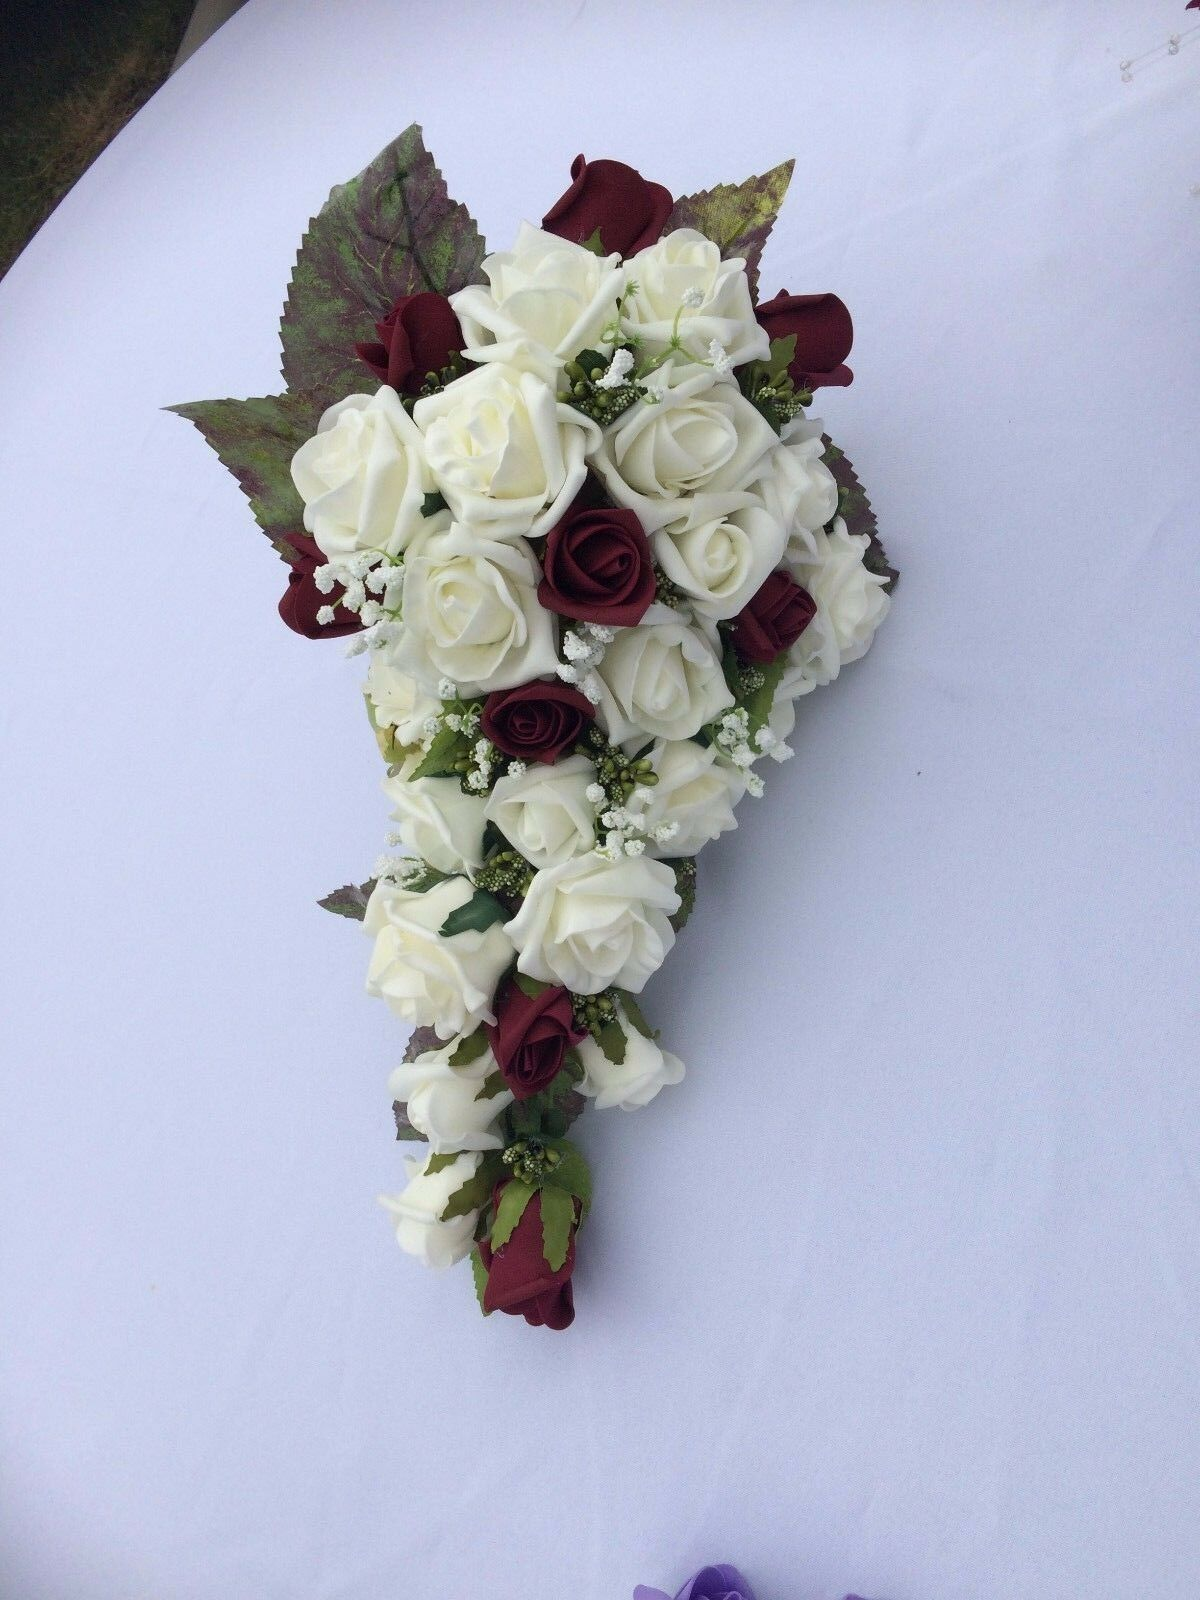 NEW Wedding Flowers Bride's Shower Bouquet Burgundy & Ivory with Gyp